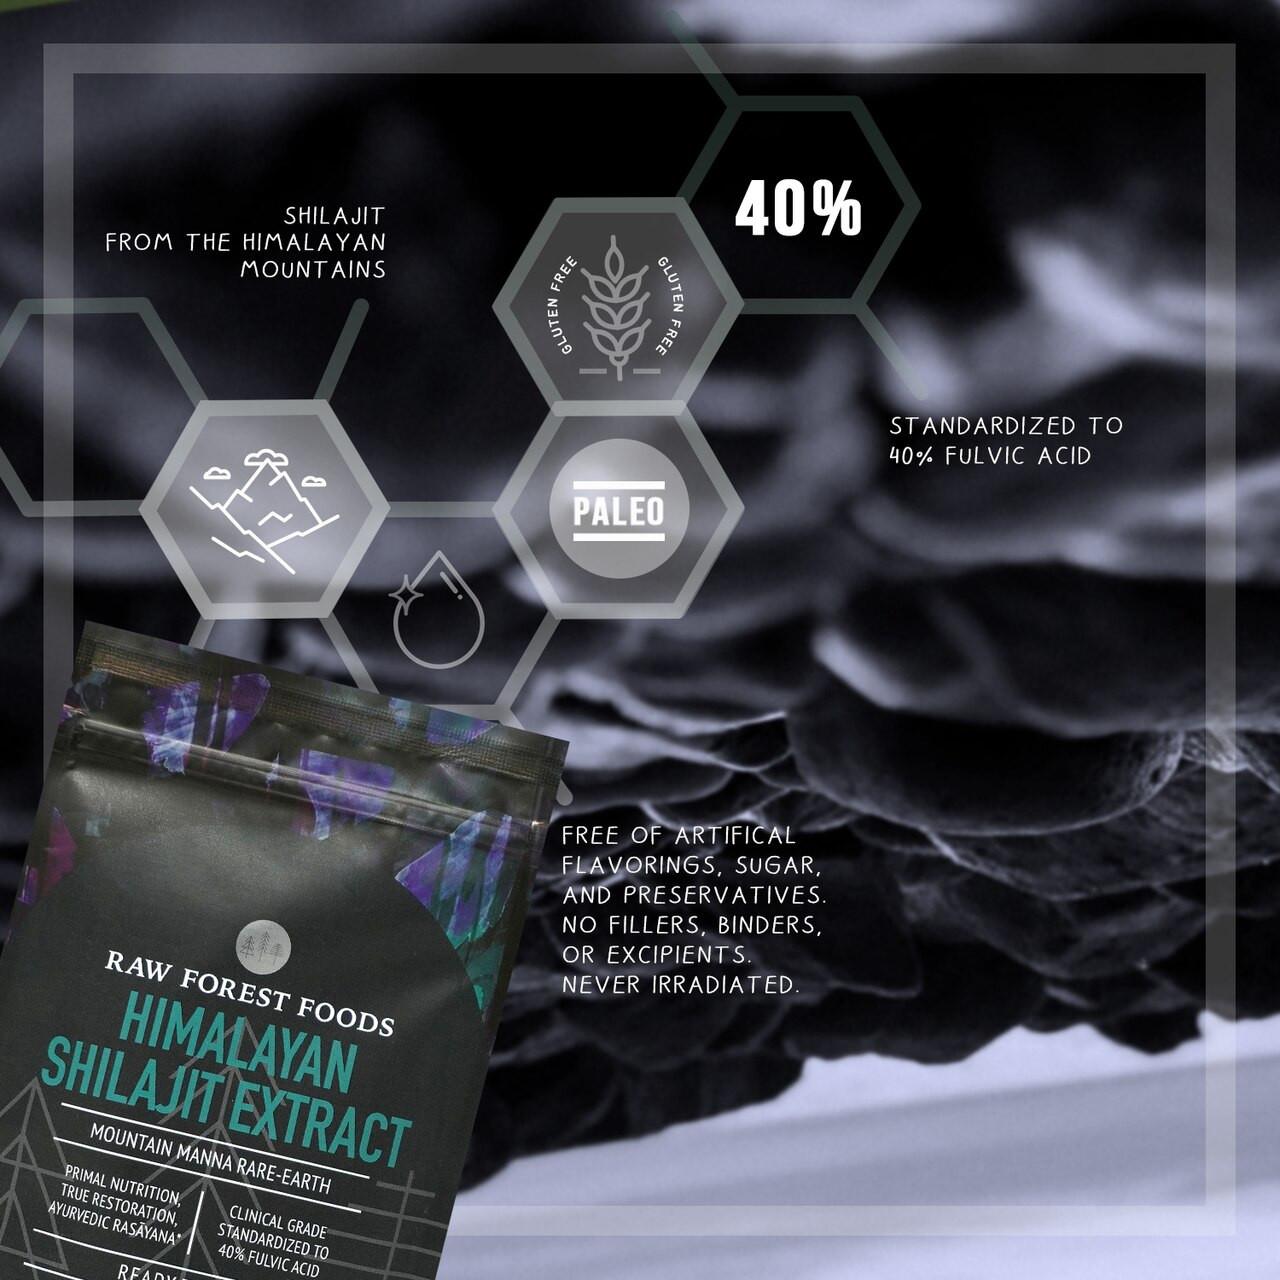 RAW Forest Foods Shilajit Extract Powder — Mountain Mana Rare-Earth — 40percent Fulvic Acid